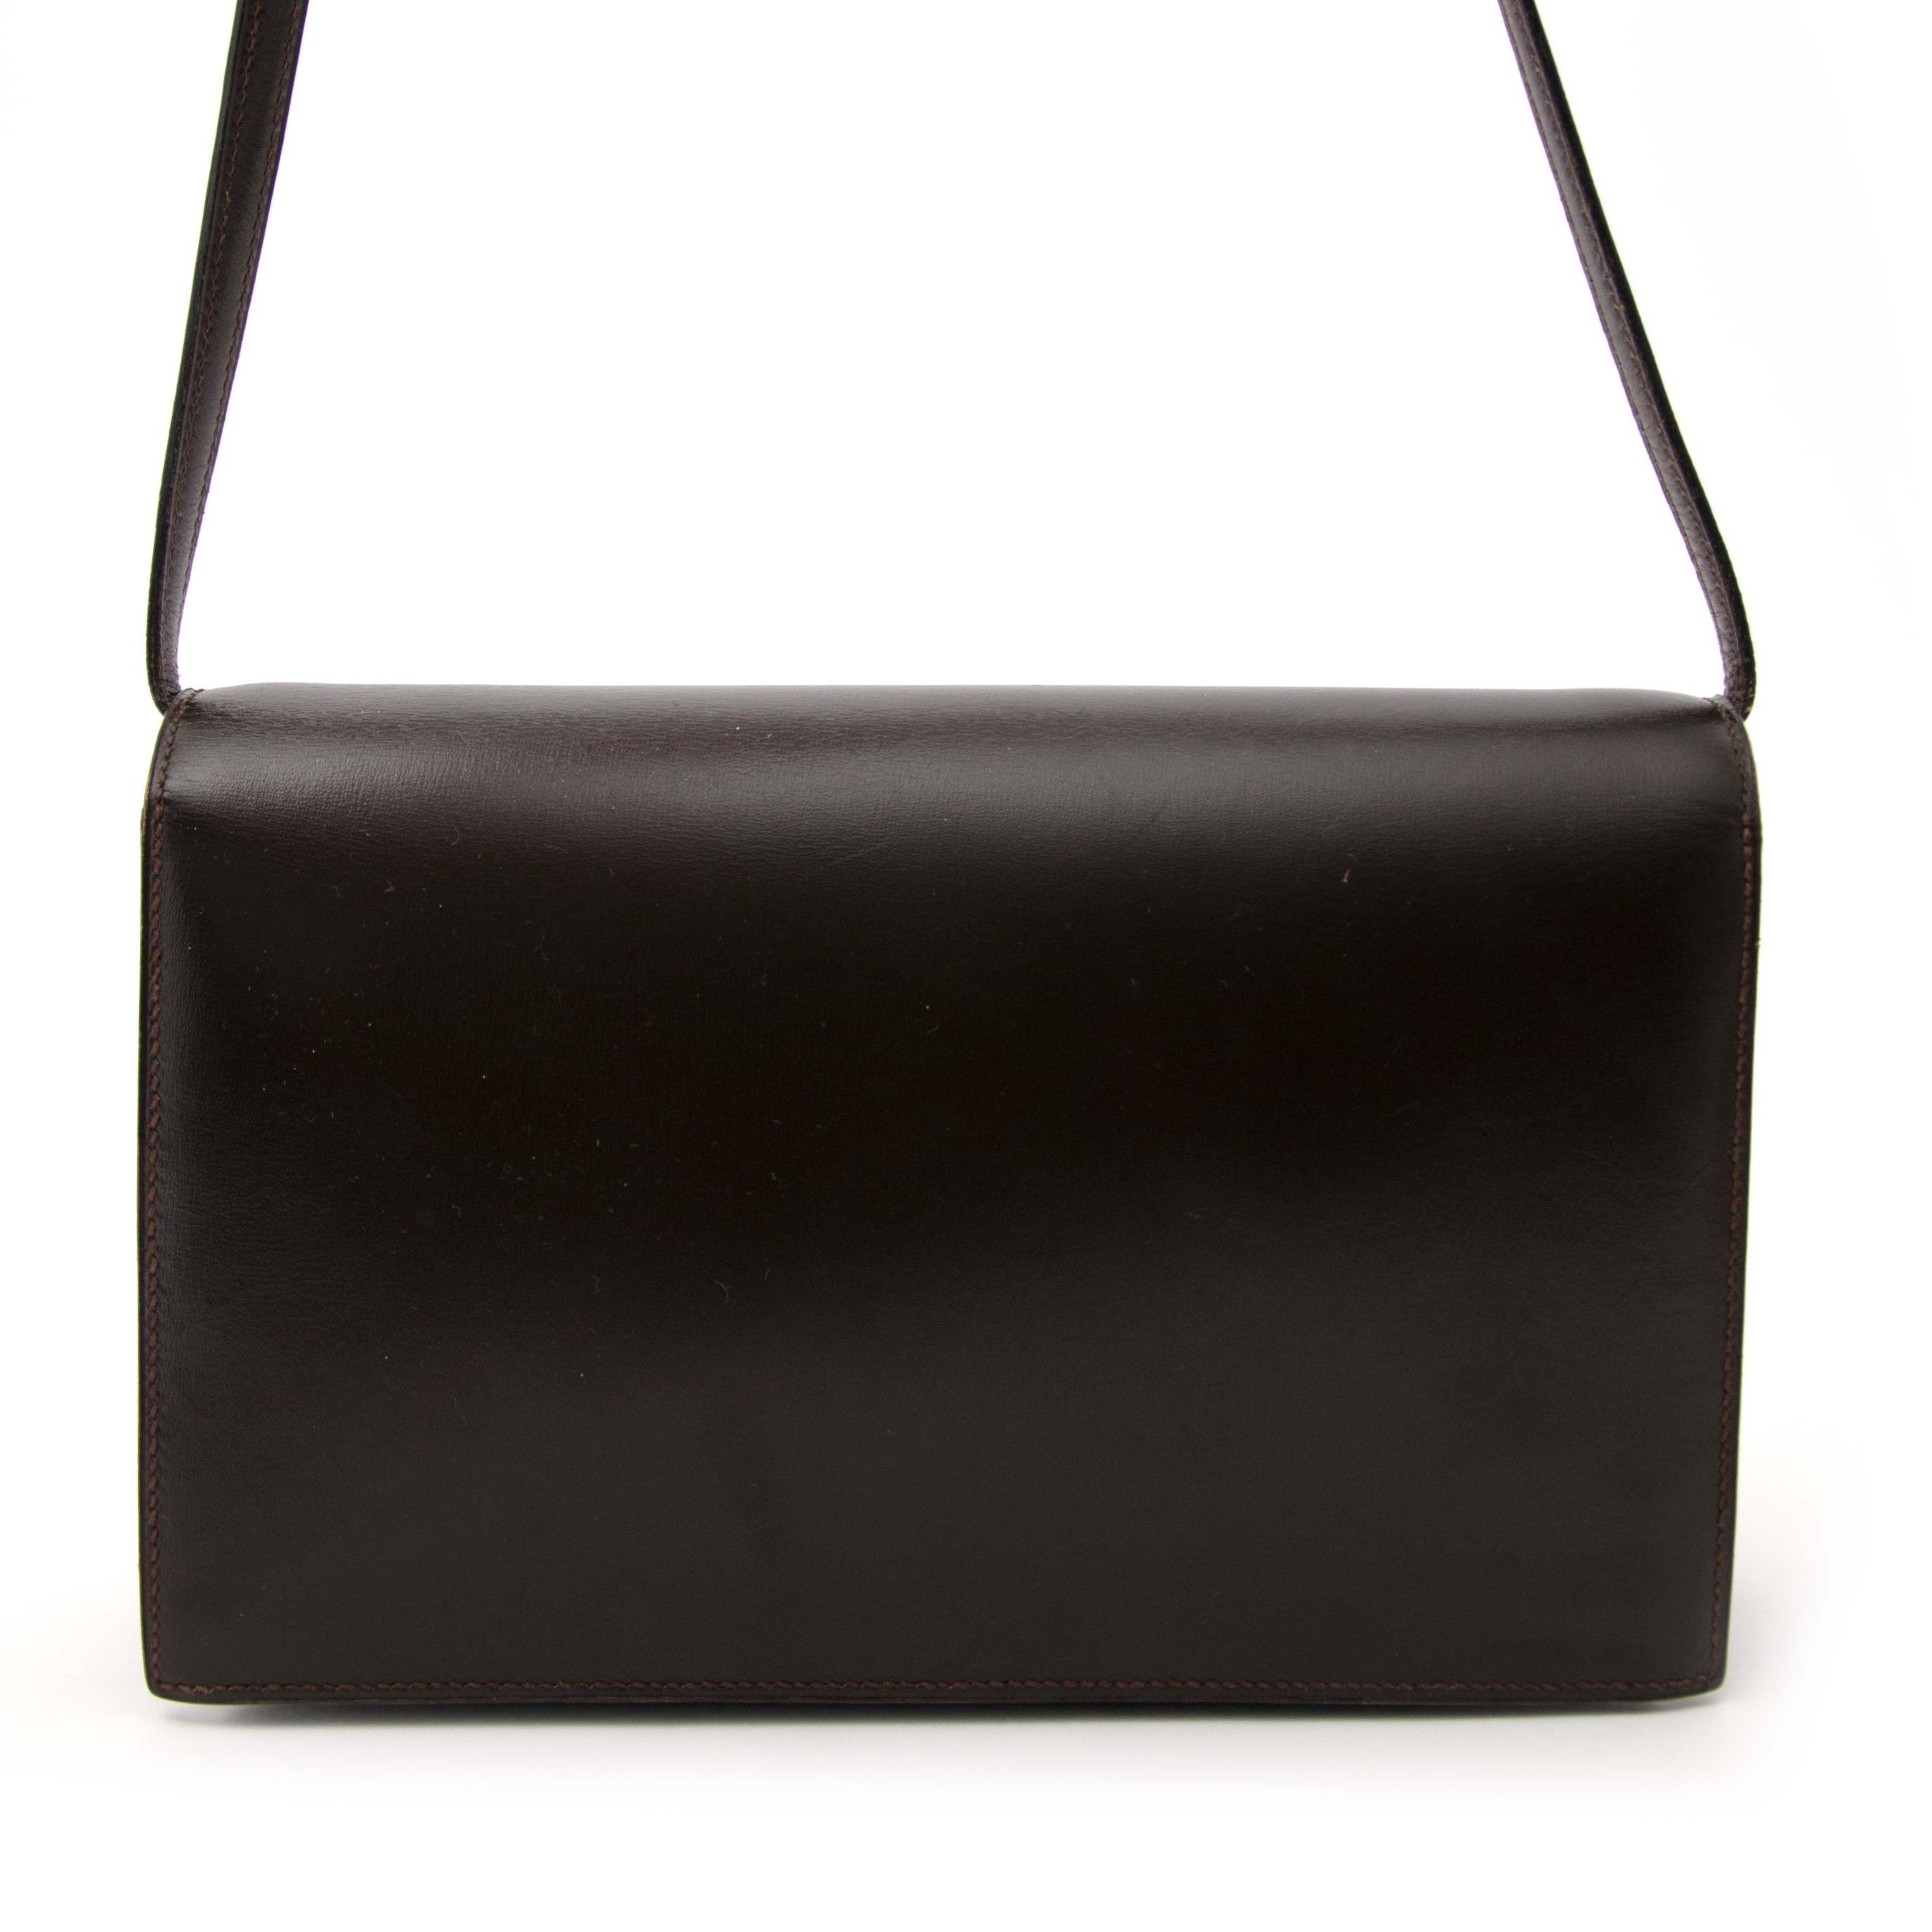 Authentieke tweedehands Hermès handtas/clutch Labellov